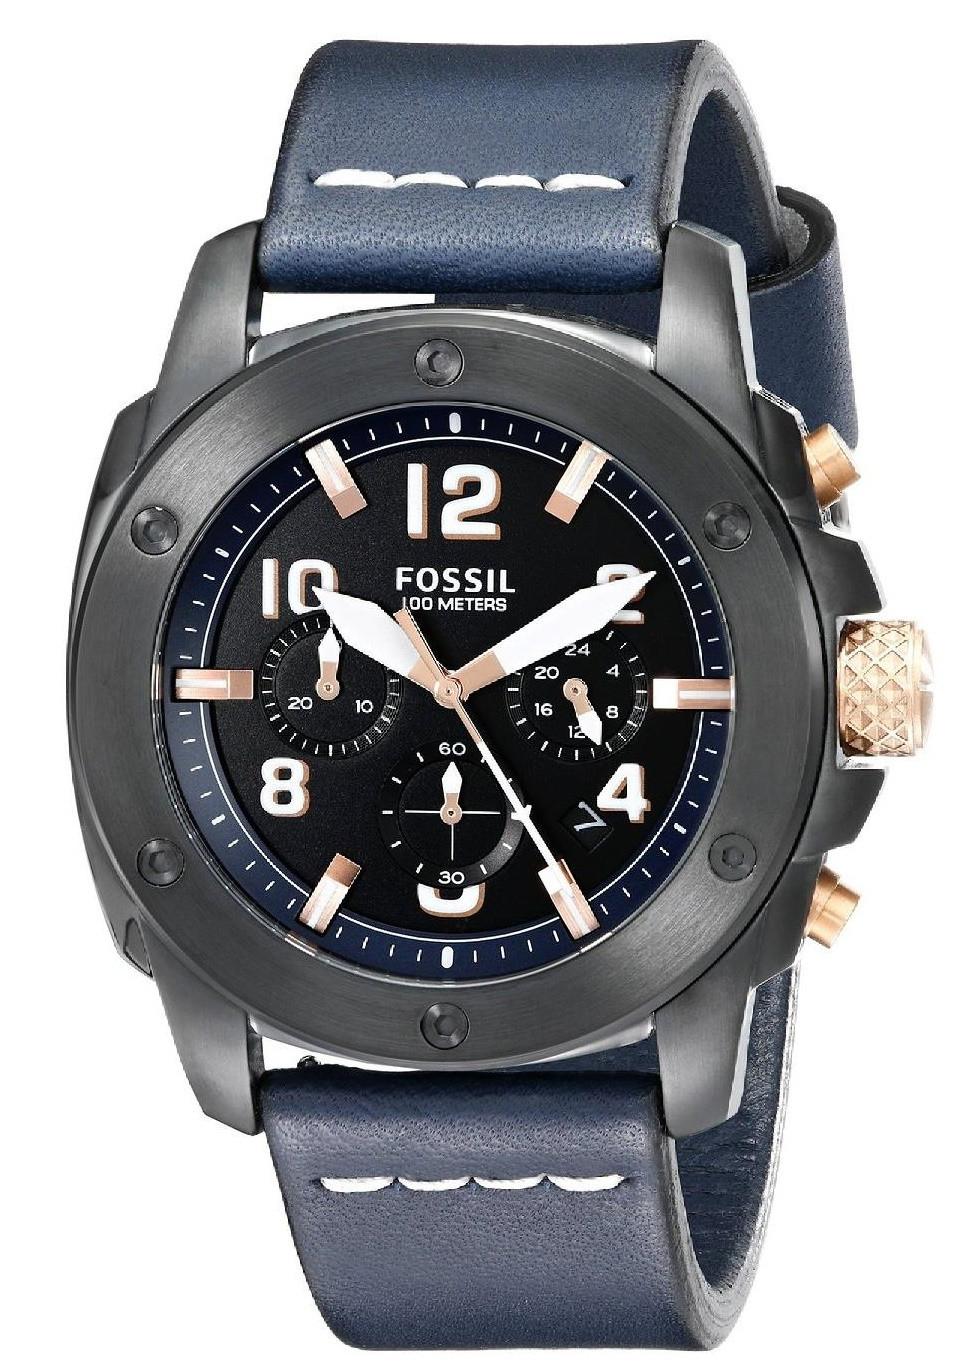 Fossil Men's Modern Machine Chronograph Blue Leather Watch FS5066